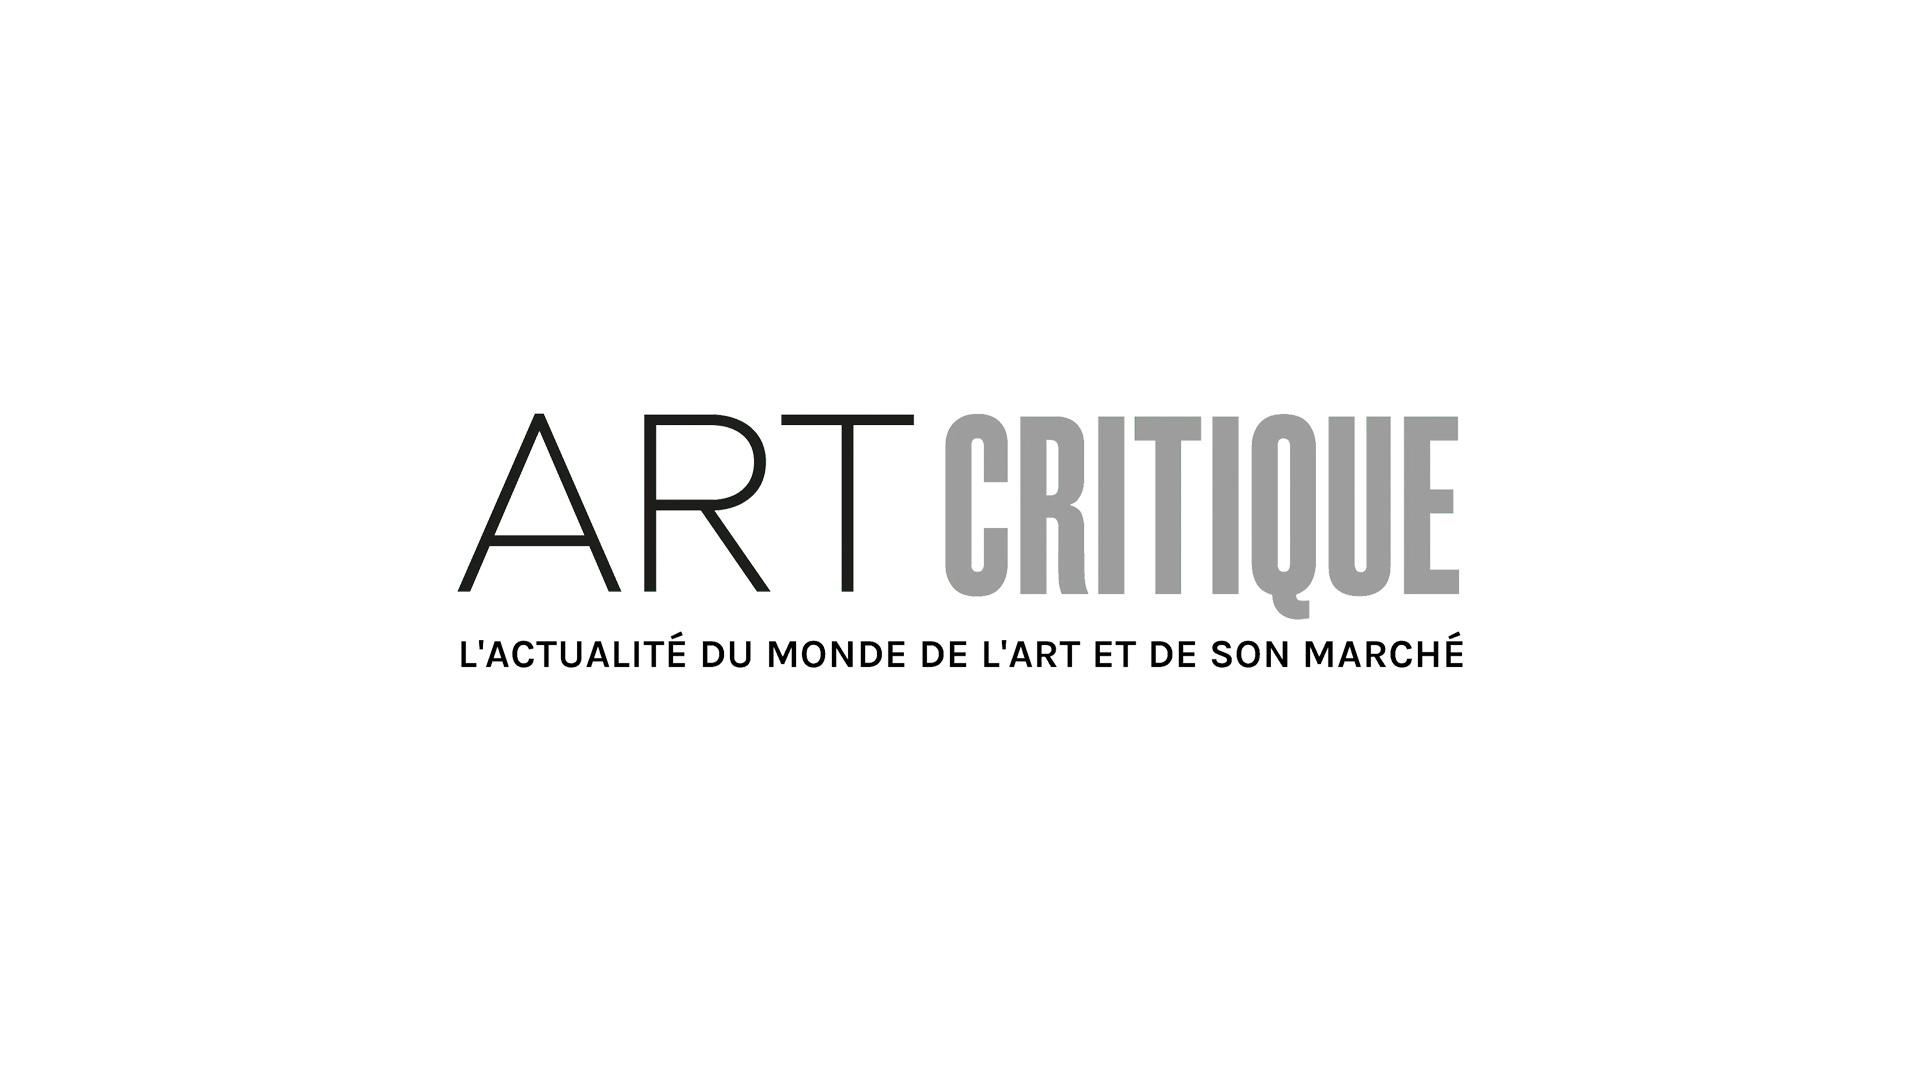 Artemisia Gentileschi exhibition one of many to be postponed